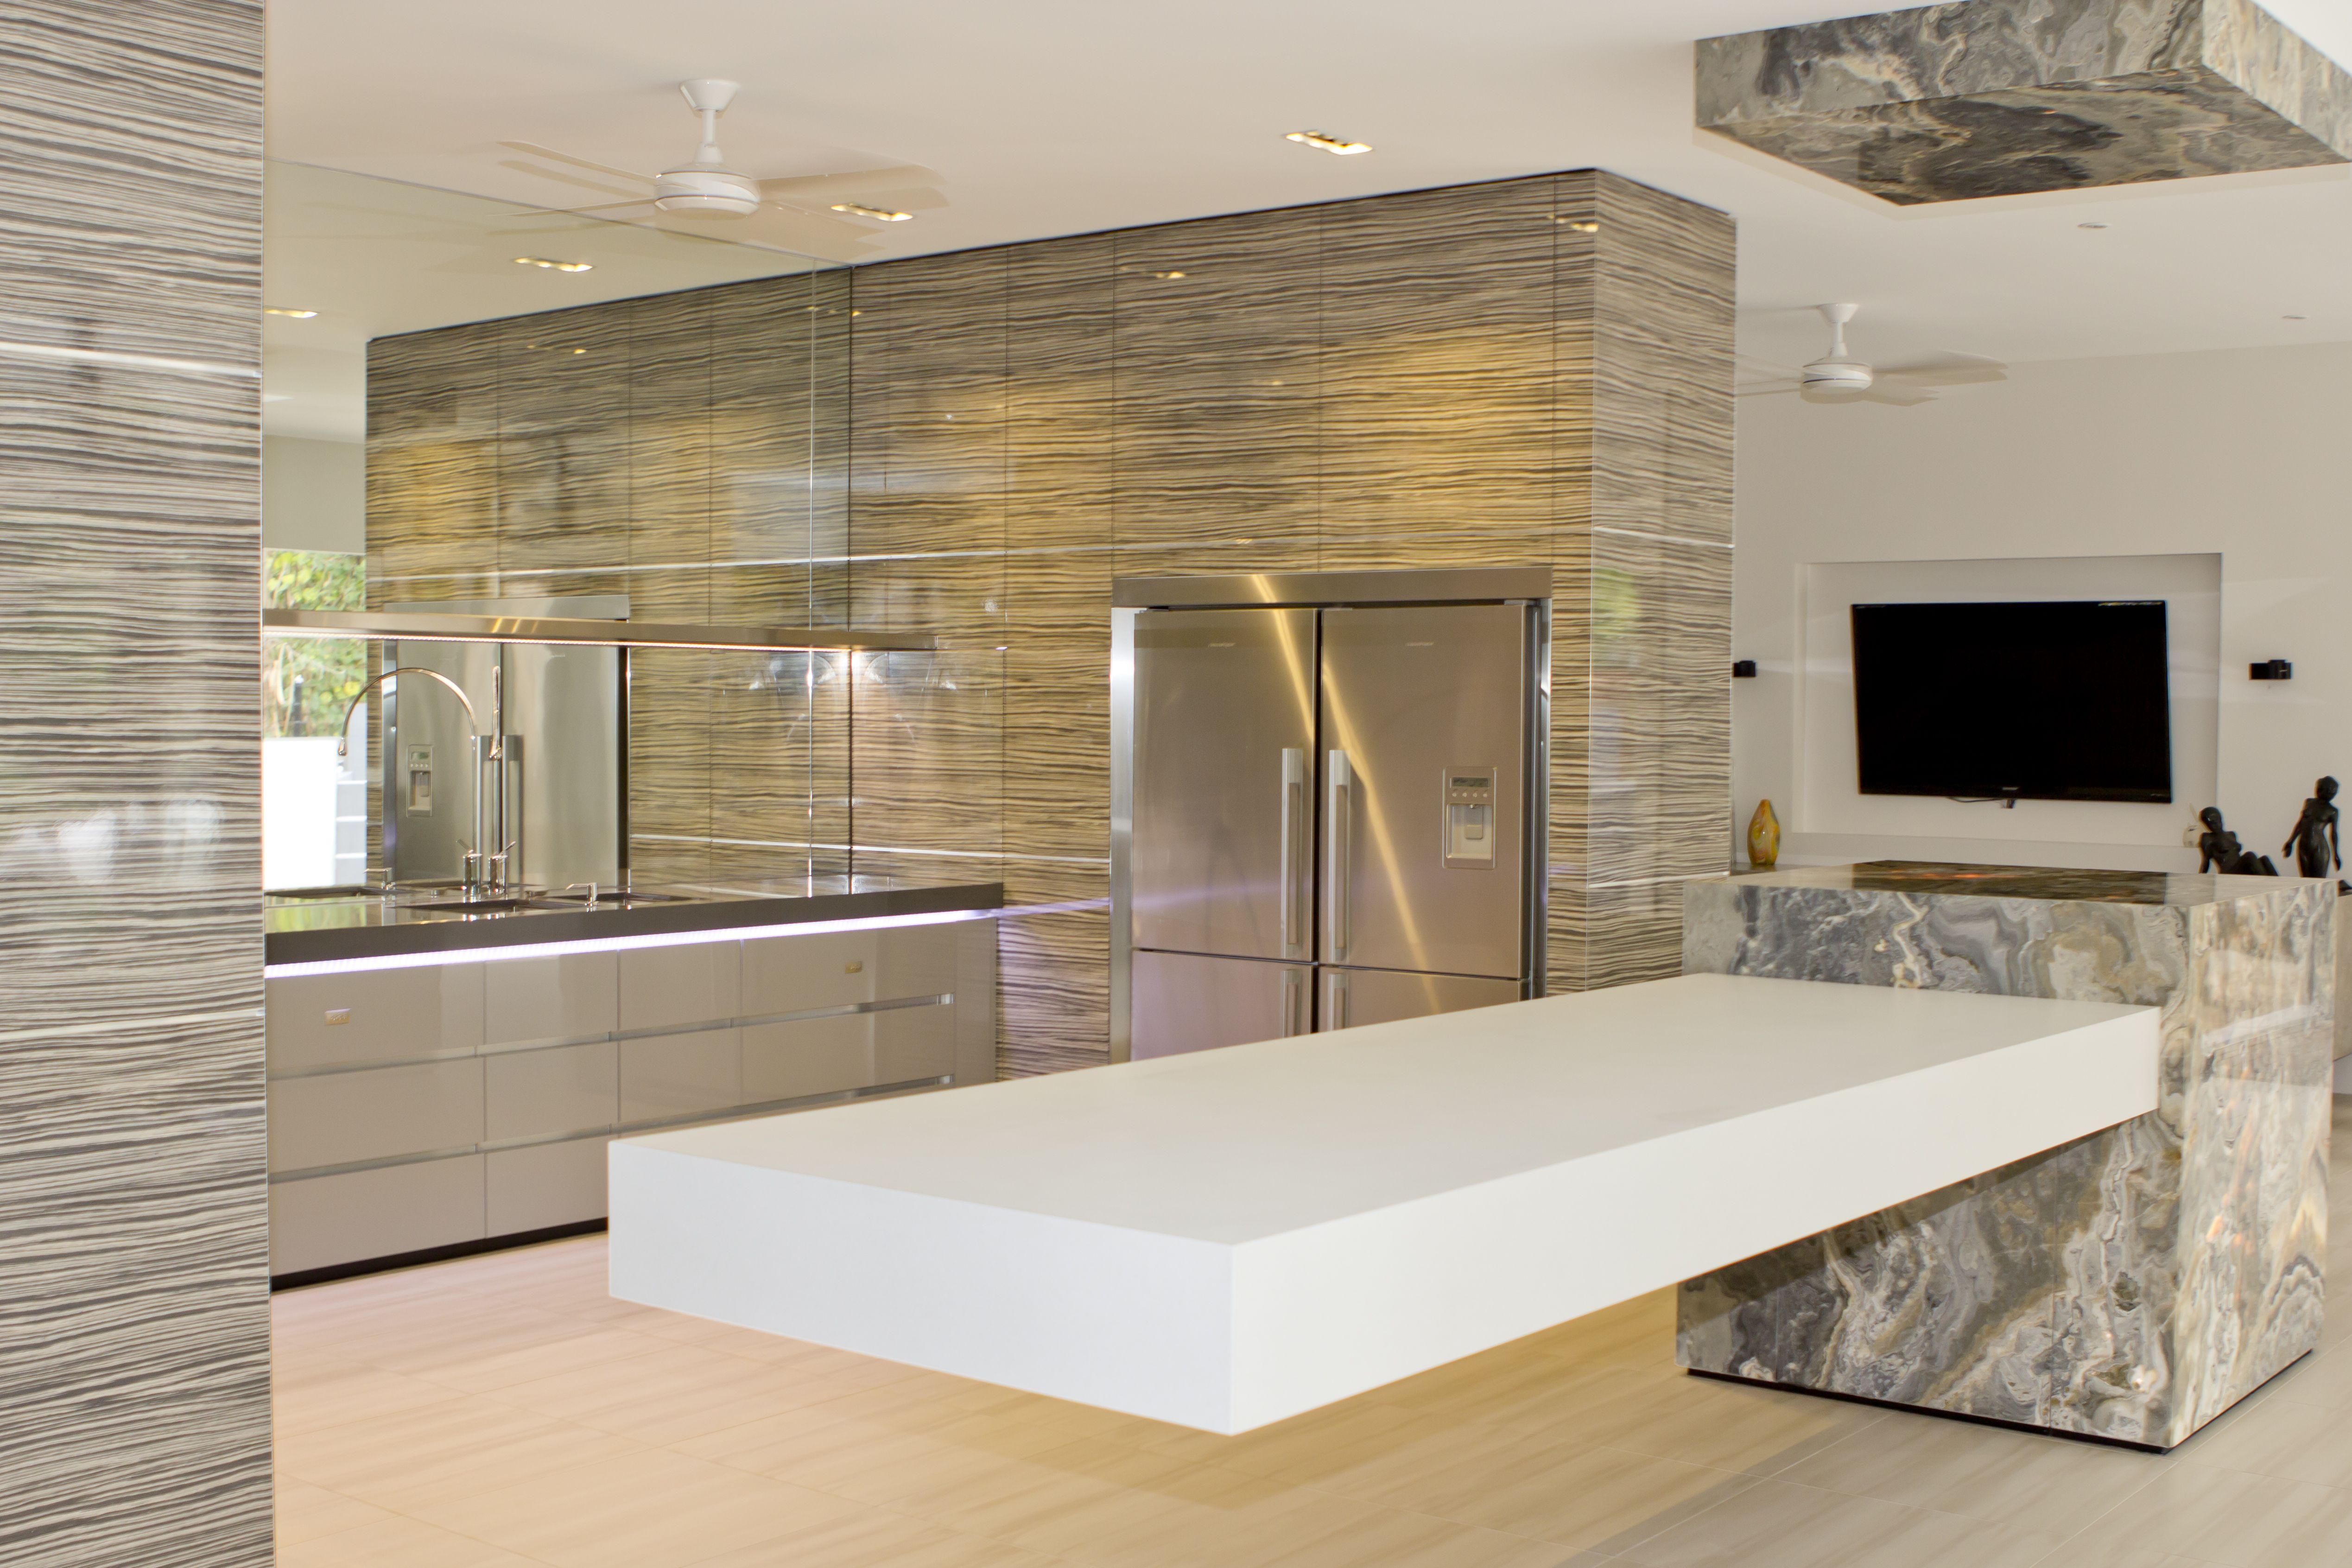 laminex kitchen design. Entrants  Artizan Cabinets Month May Products used Laminex CrystalGloss Ebony Bellezza Kitchen DesignsAward